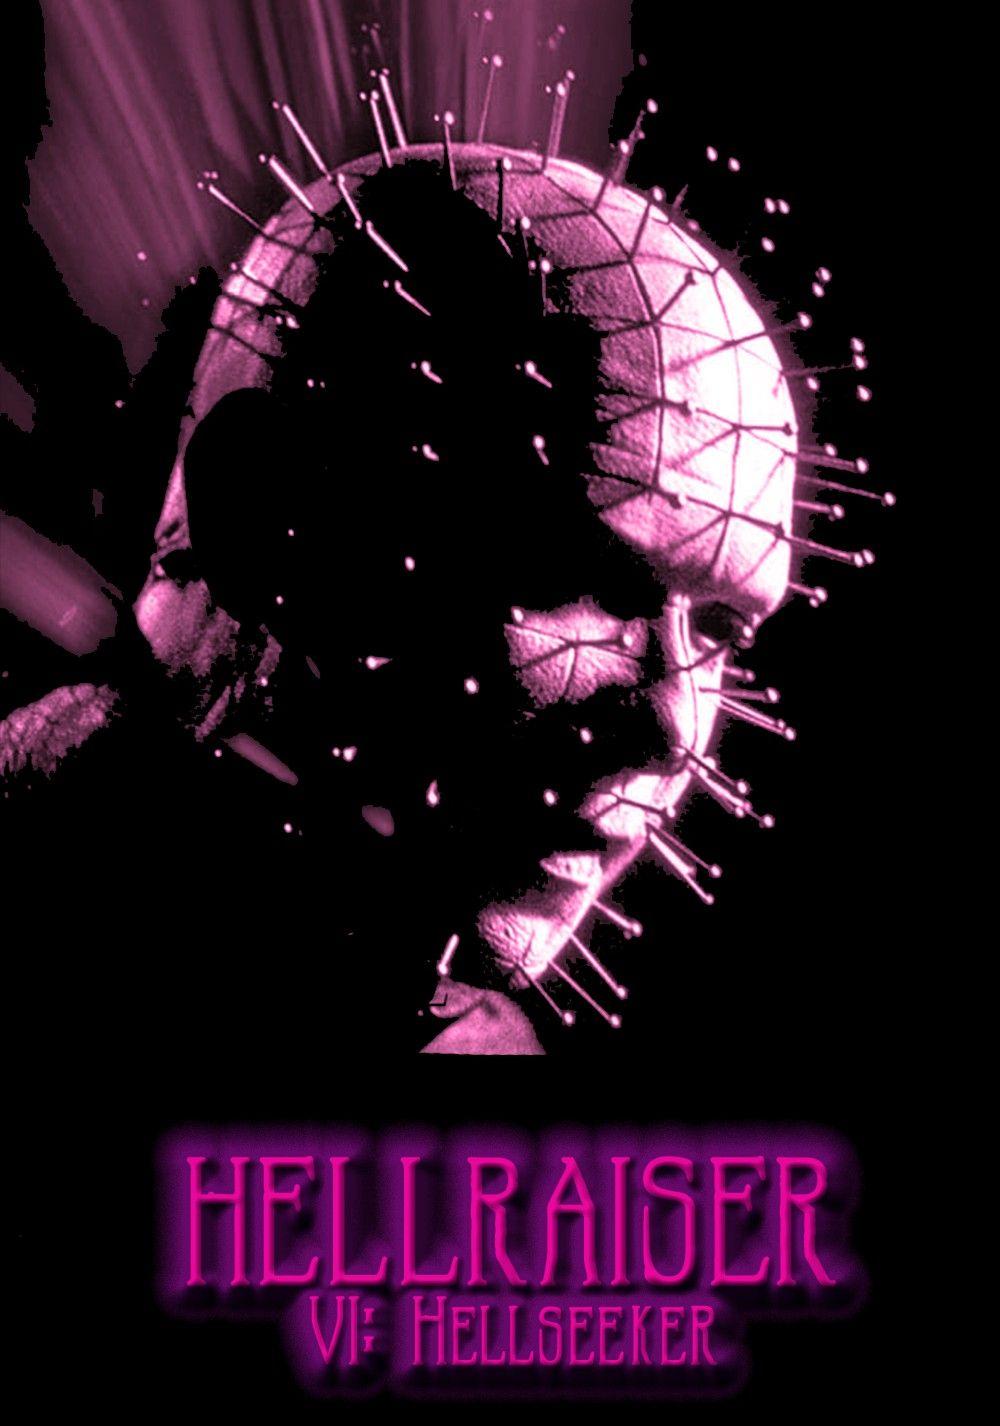 Hellraiser 6 Hellseeker 2002 Hellraiser Neon Signs Horror Films